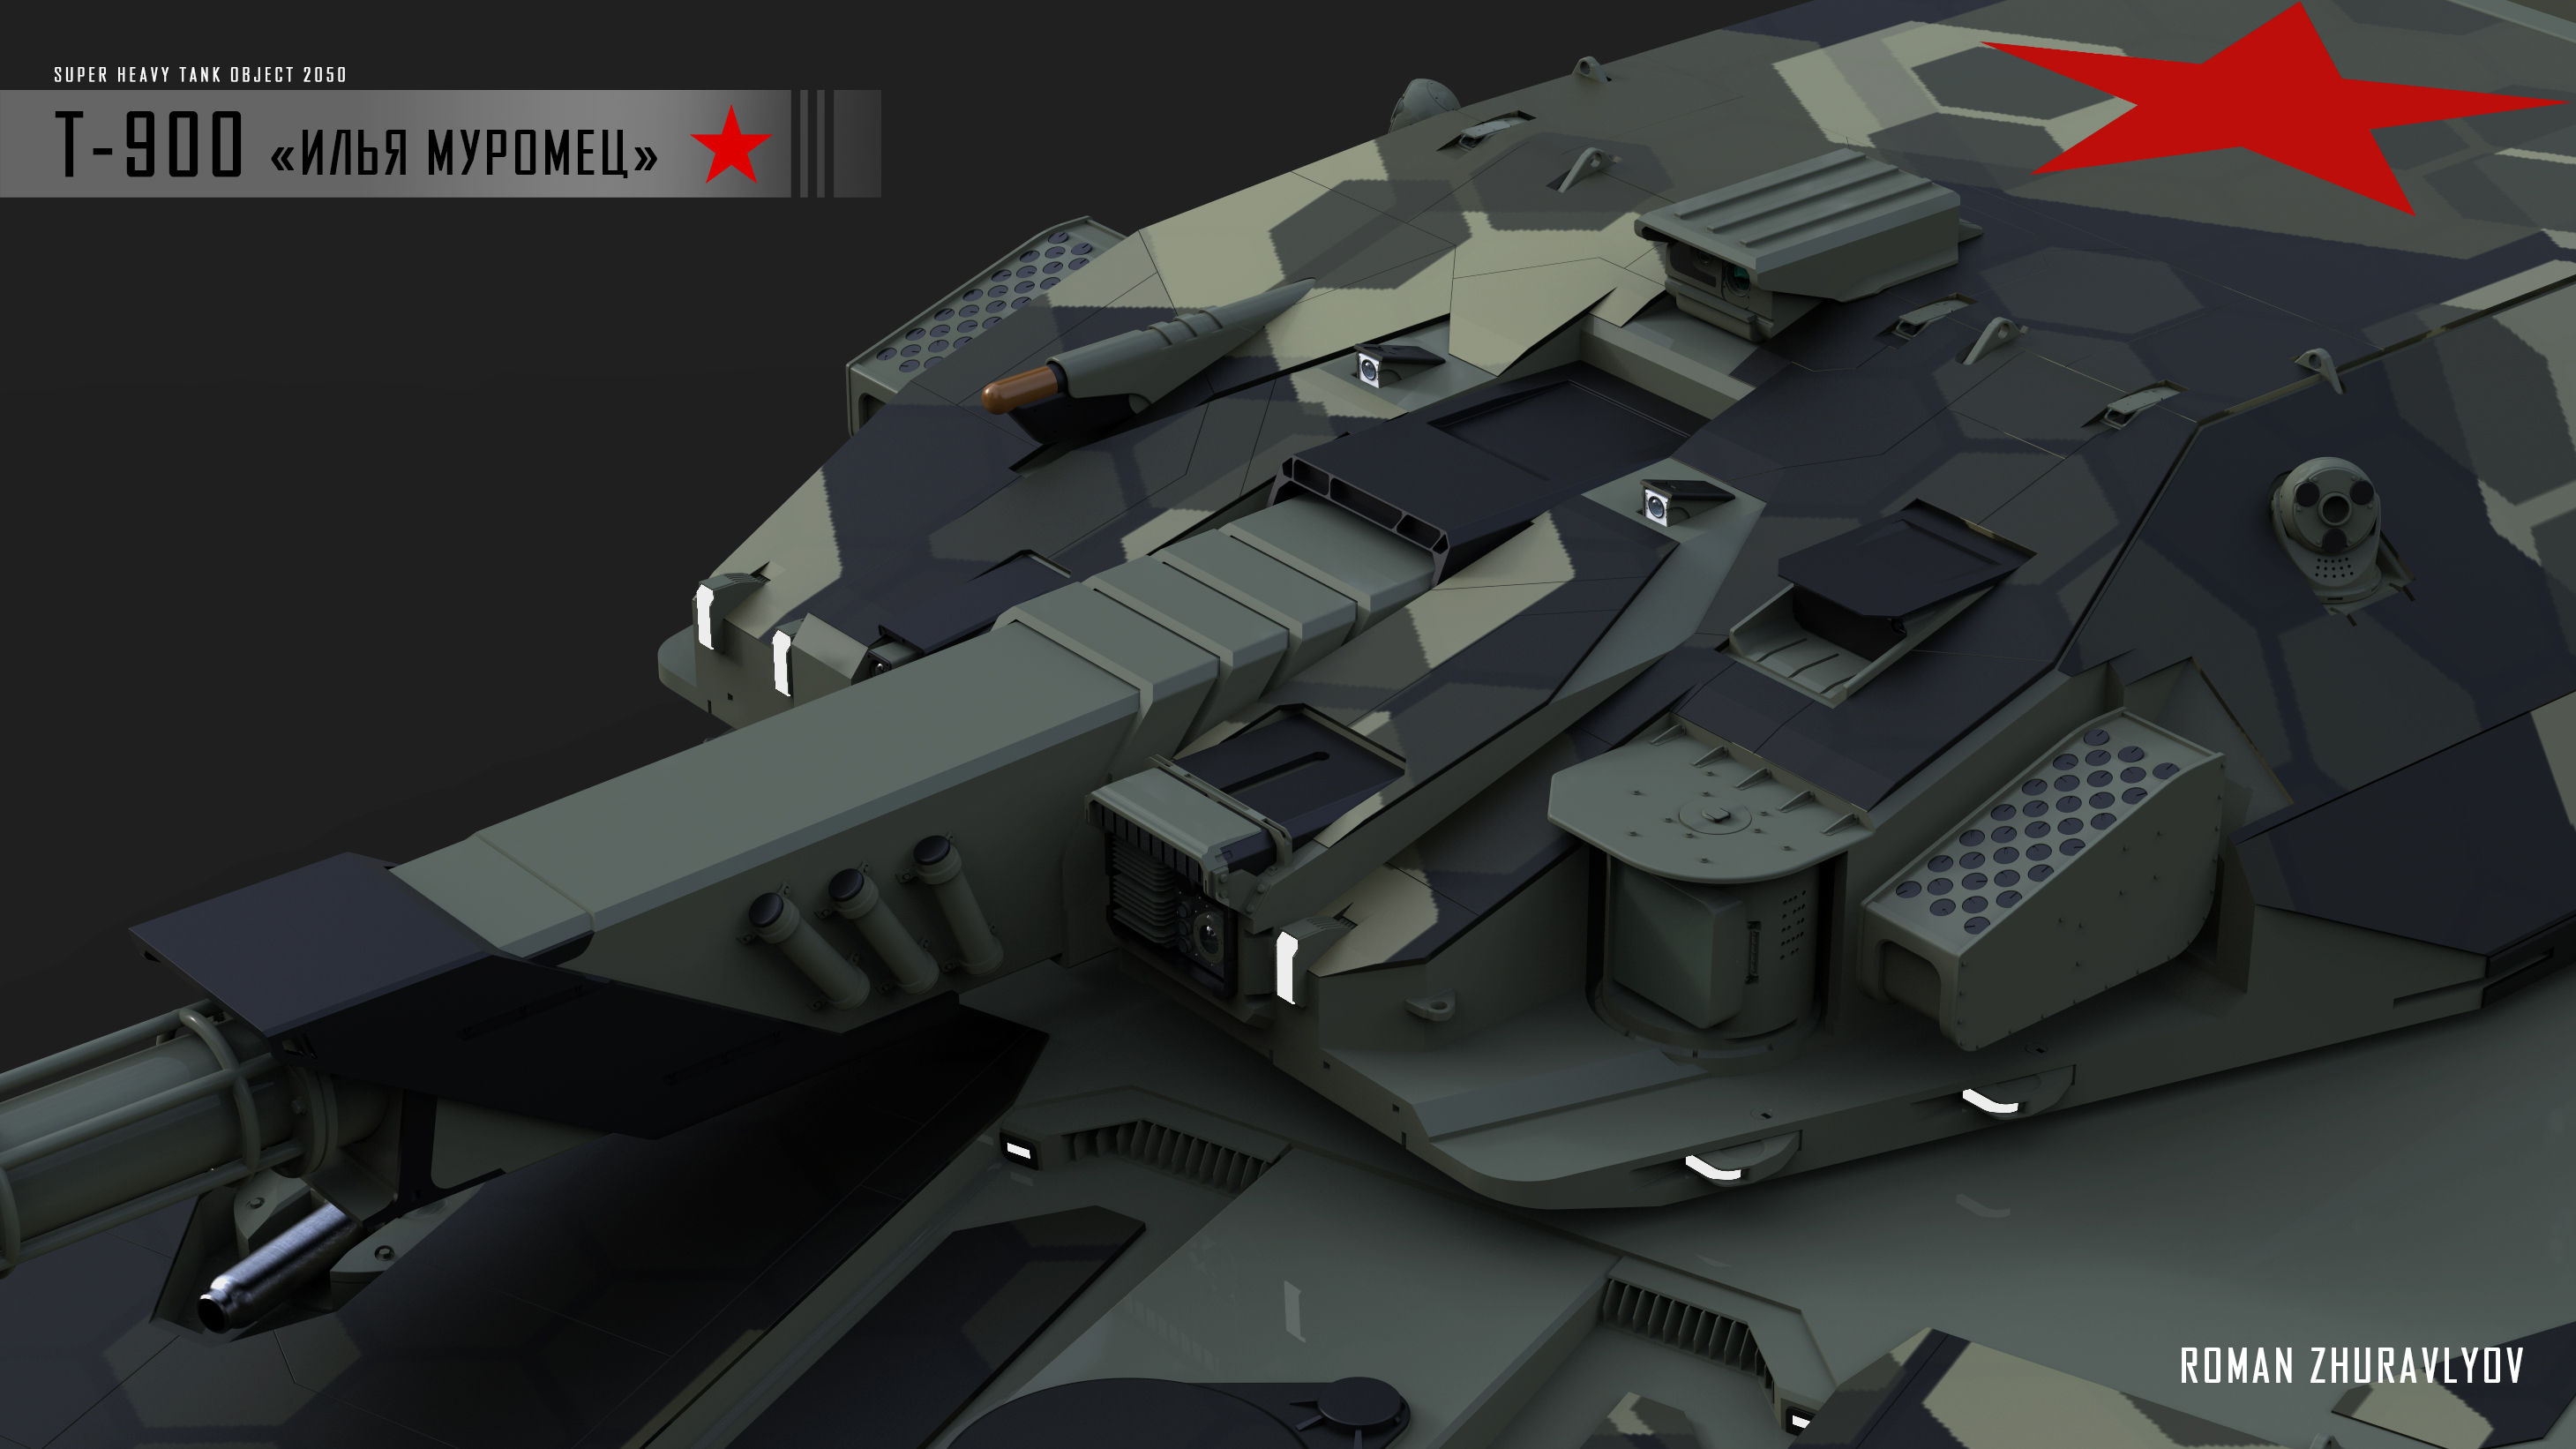 T-900-2-3500-3500